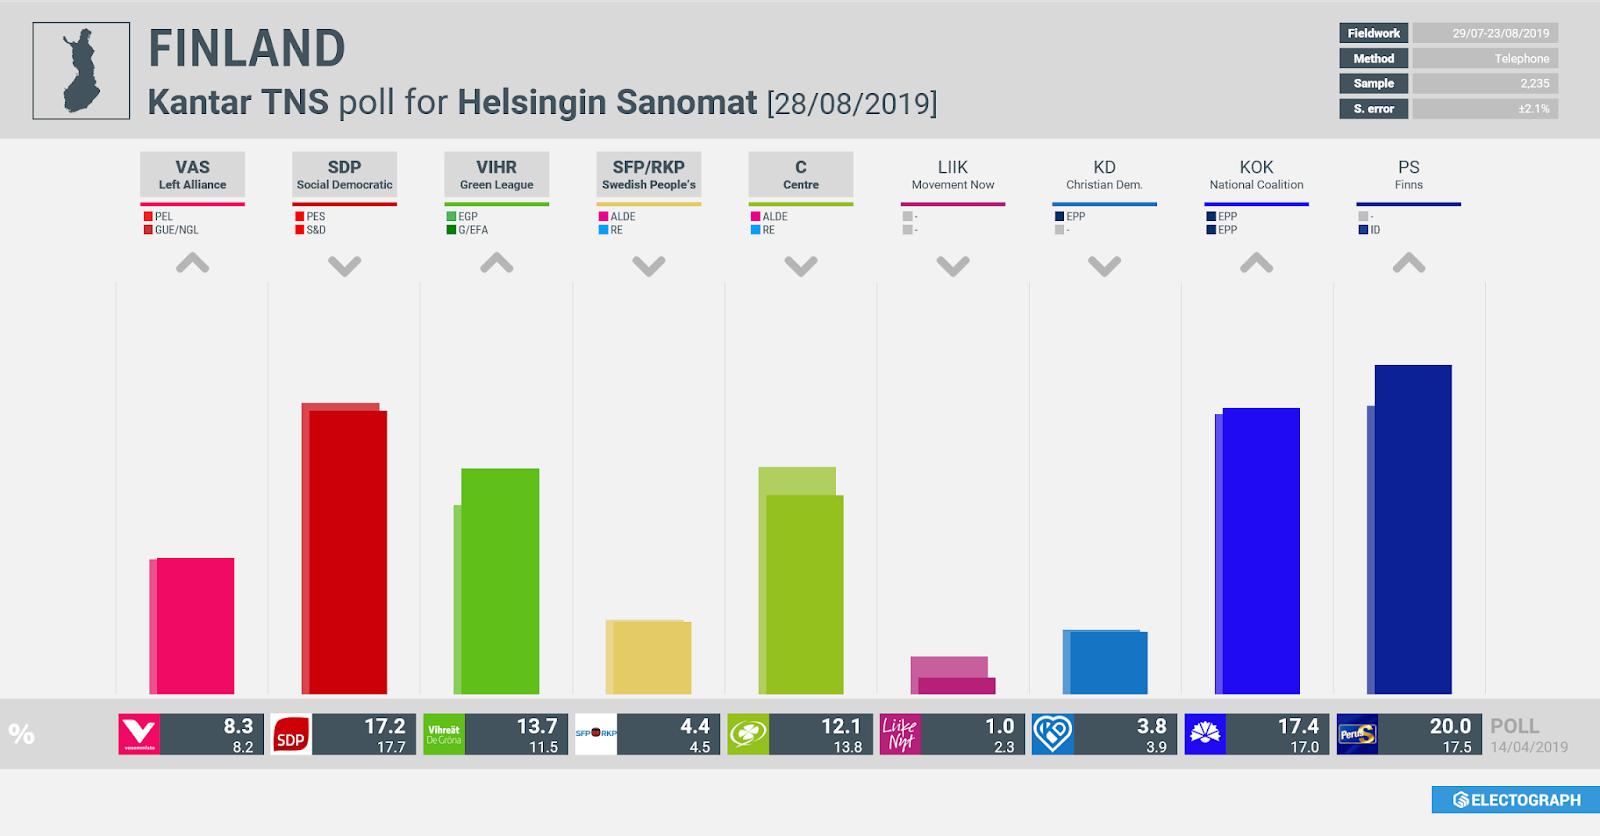 FINLAND: Kantar TNS poll chart for Helsingin Sanomat, 28 August 2019